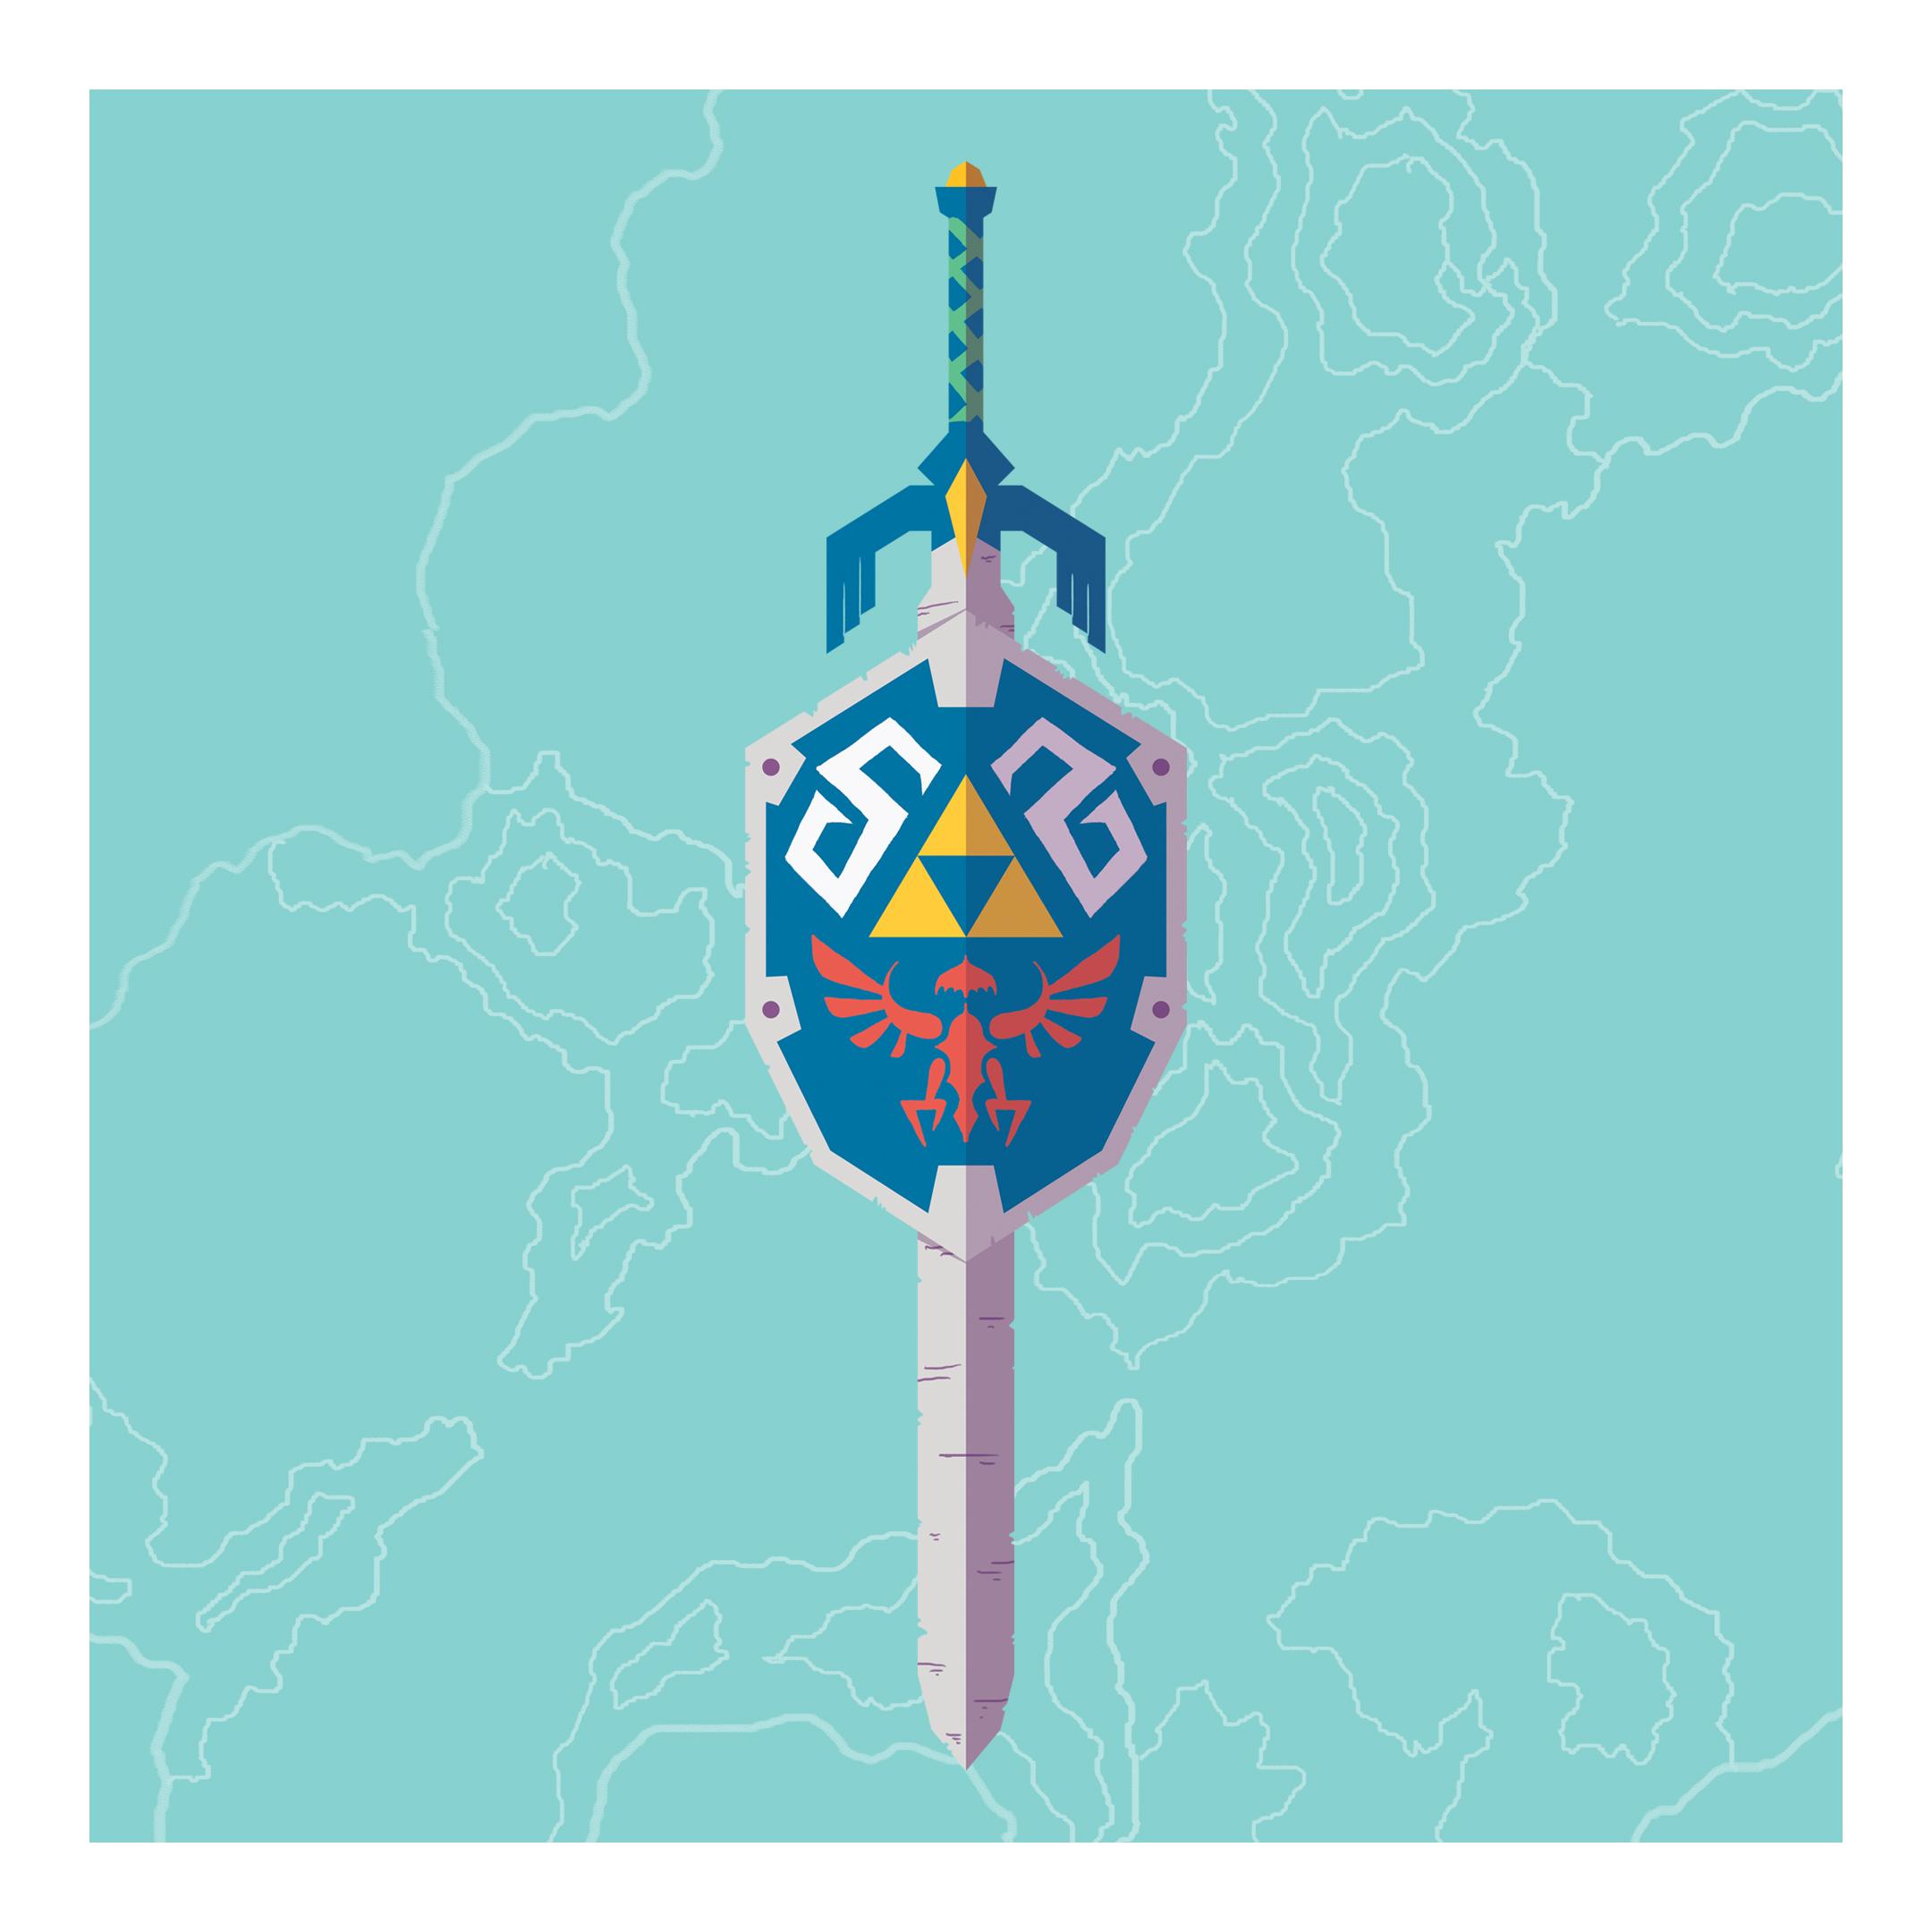 Sword N' Boredom